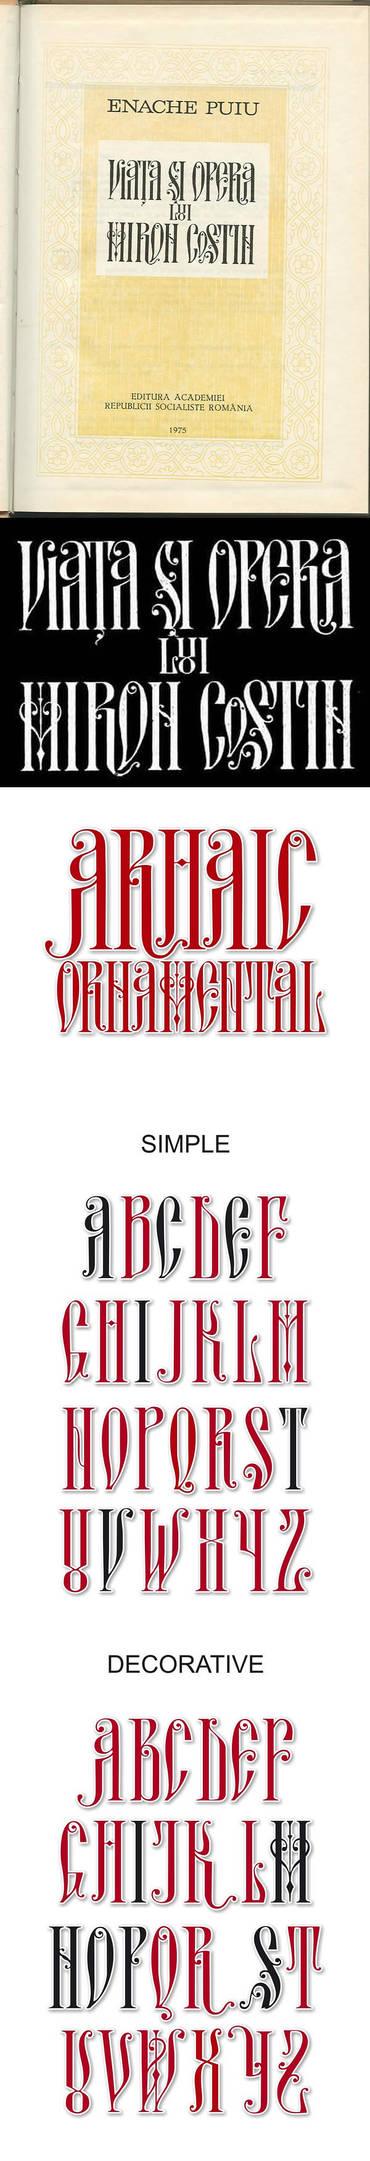 Arhaic Romanesc Ornamental